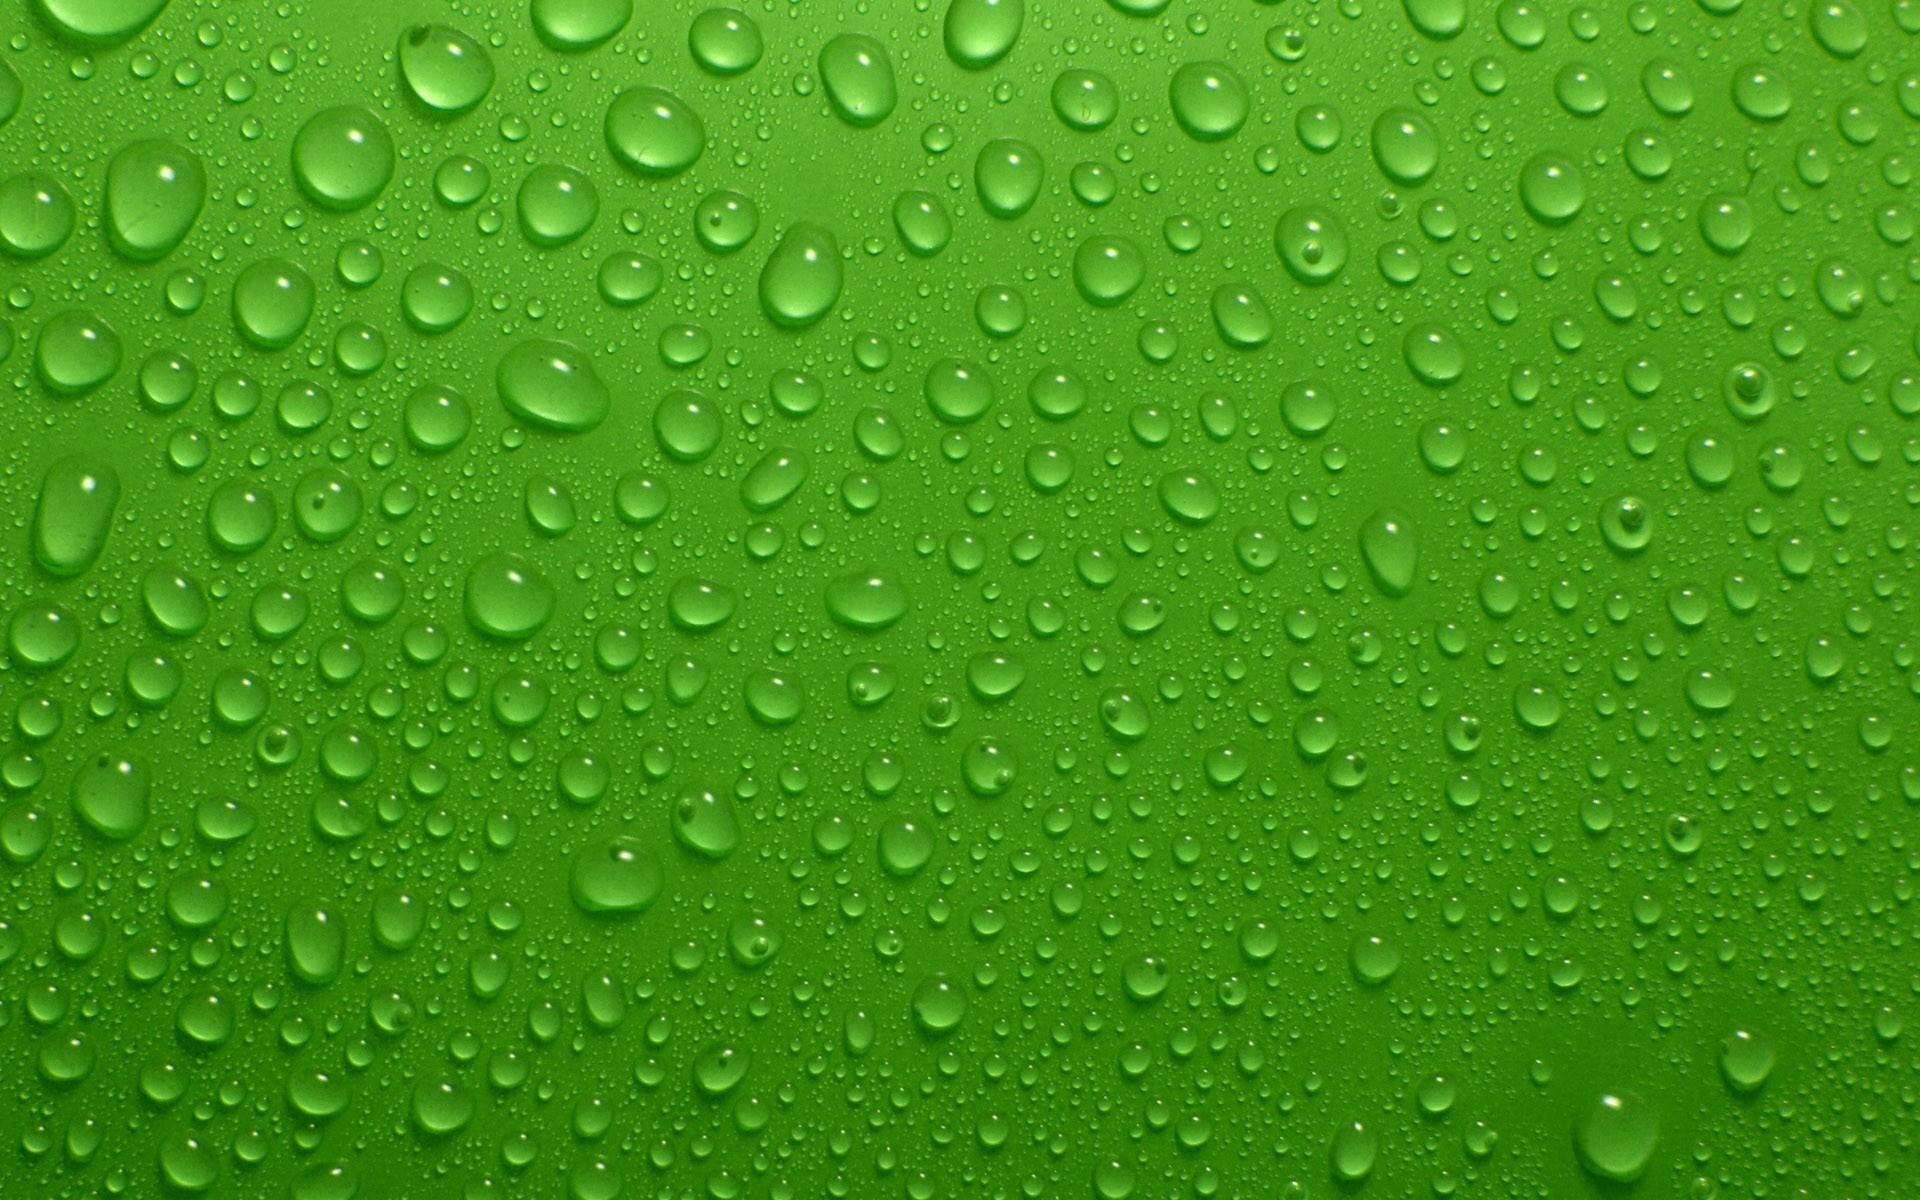 Green Background Wallpaper HD